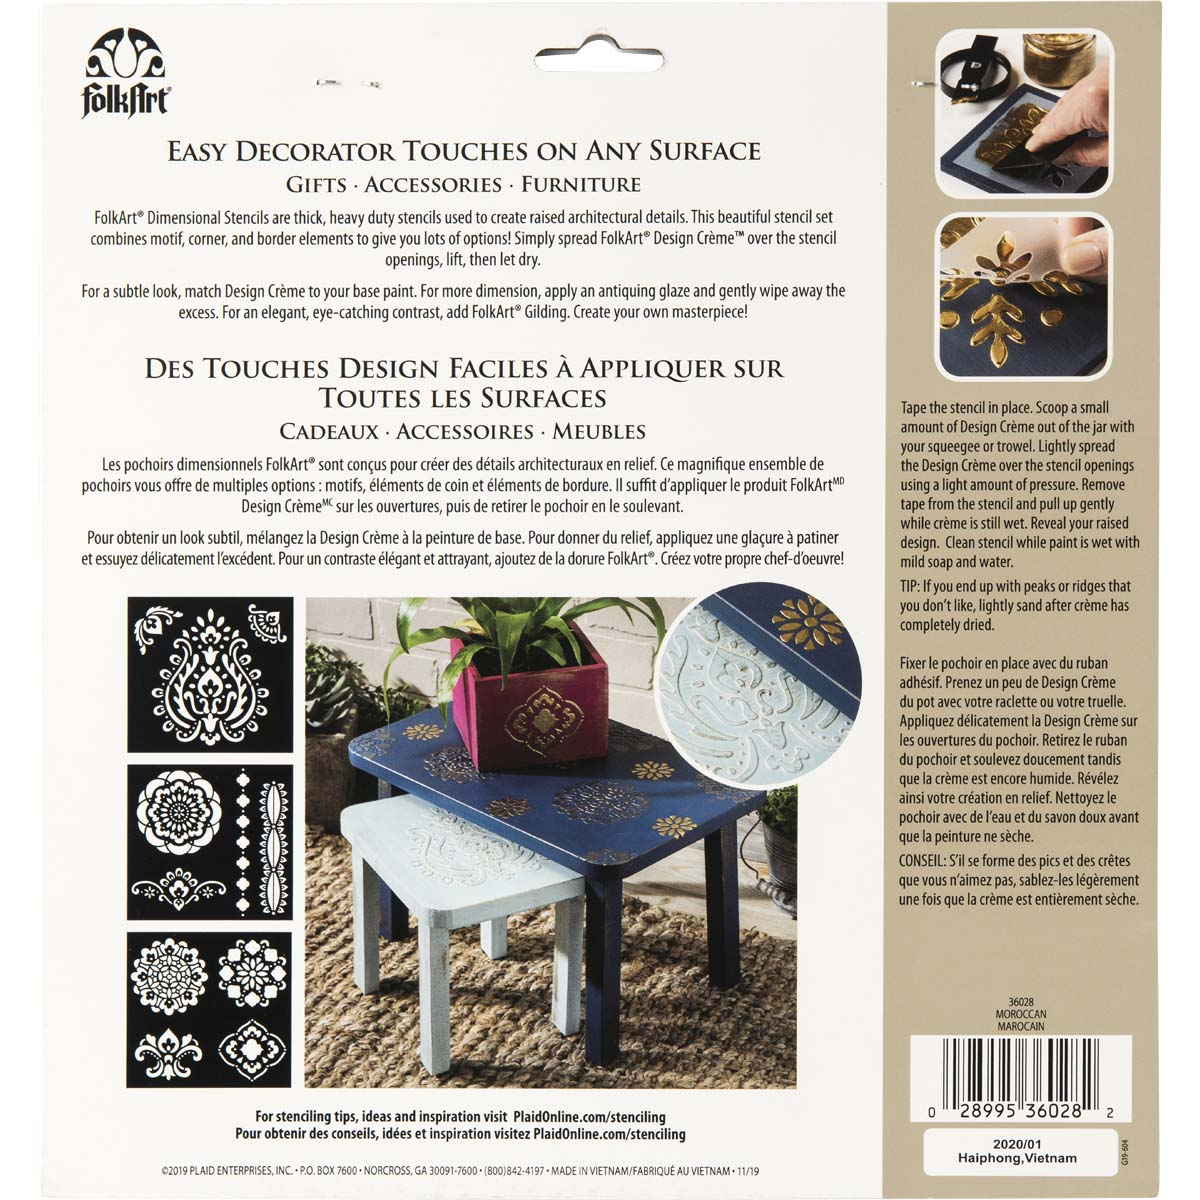 FolkArt ® Dimensional Stencil Pack - Moroccan, 3 pc. - 36028